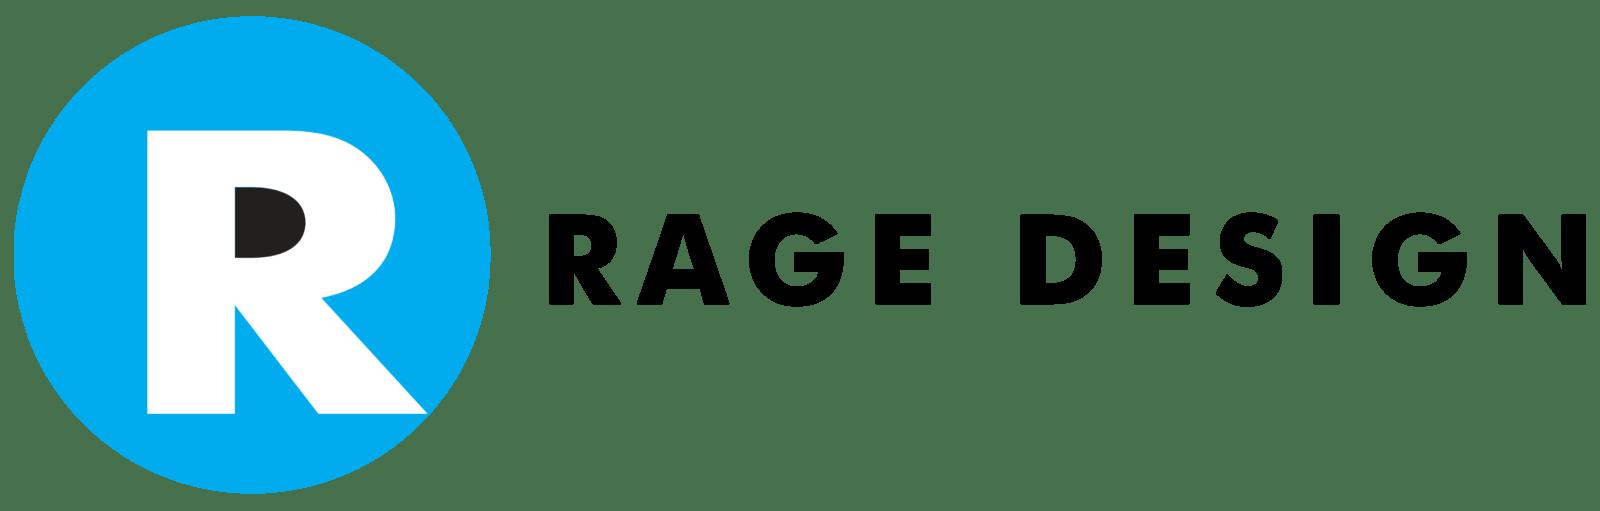 Rage Design